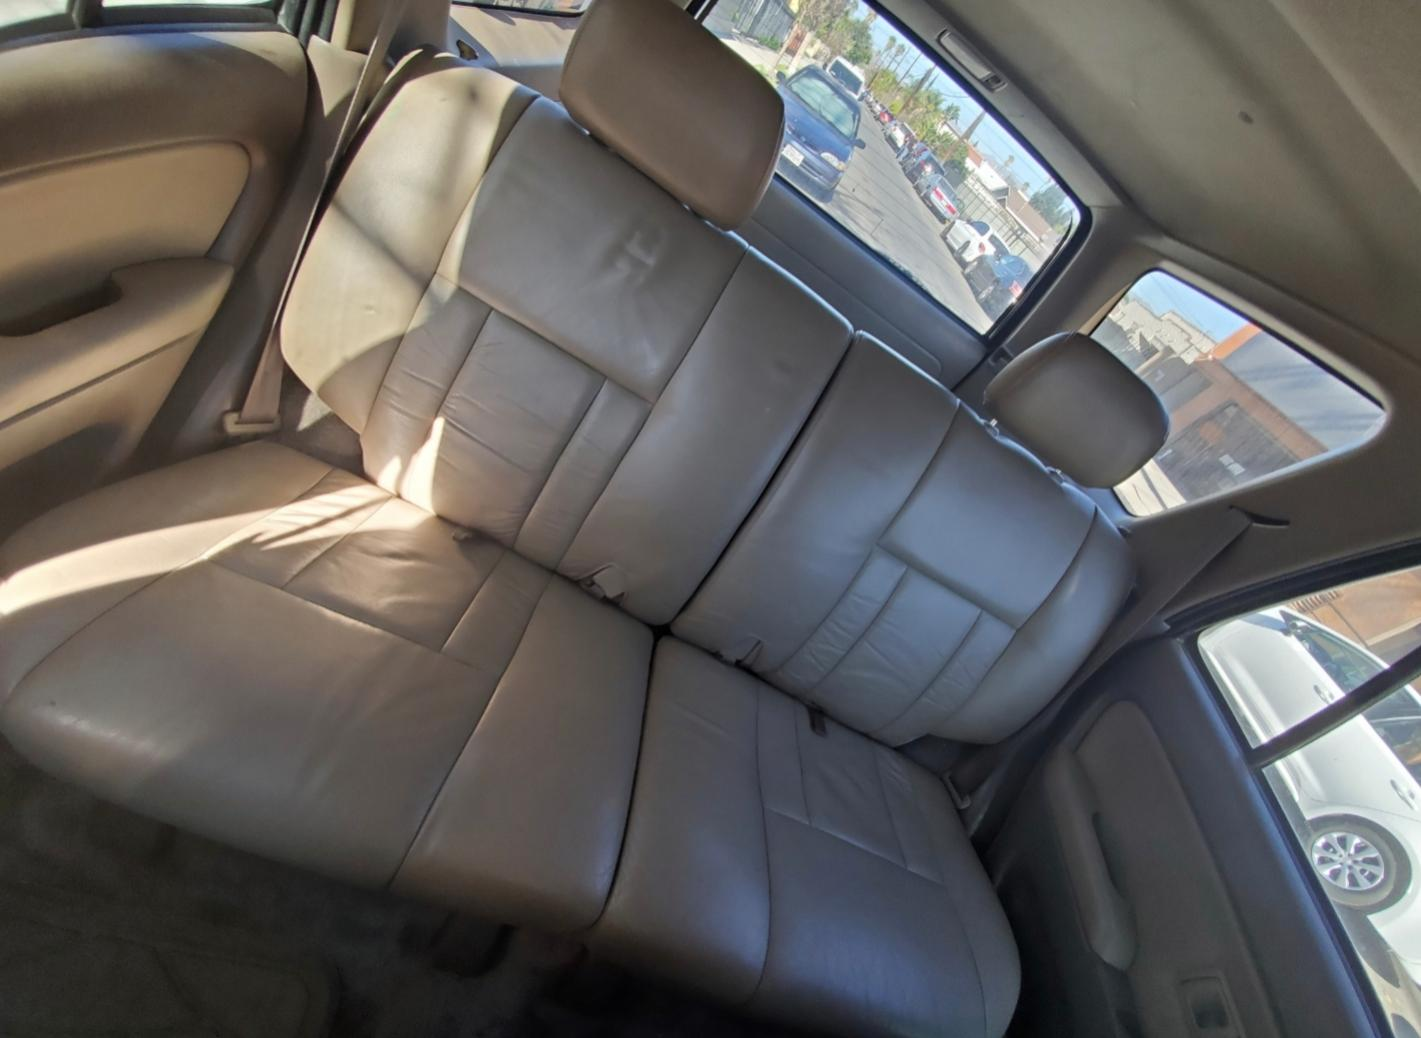 SOLD 2000 toyota 4runner 4x4 Imperial Jade North Hollywood,California 00 OBO-20200321_021827-jpg